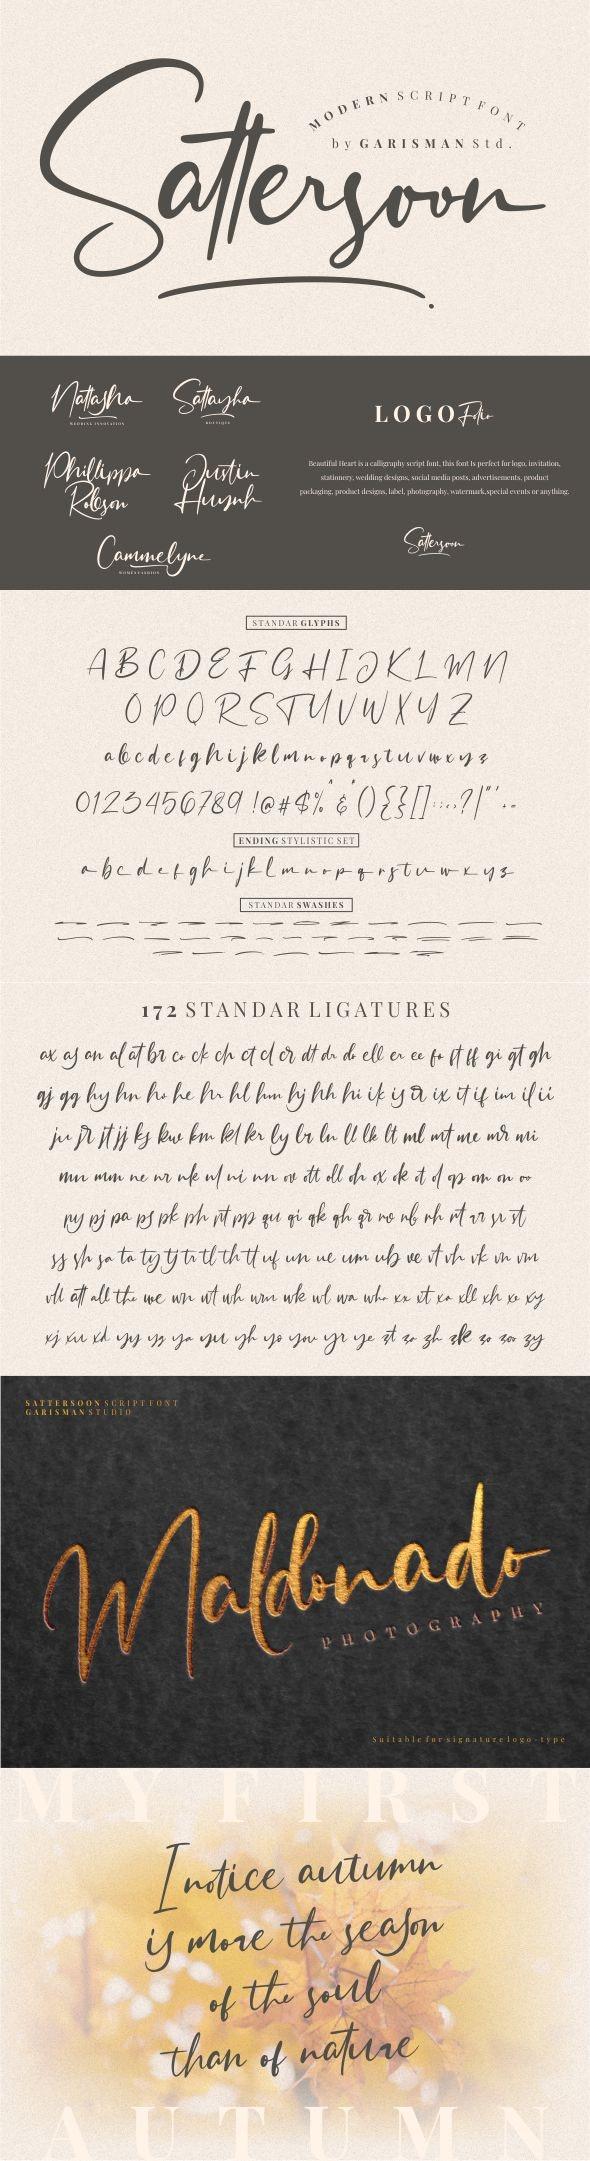 Sattersoon - Hand-writing Script